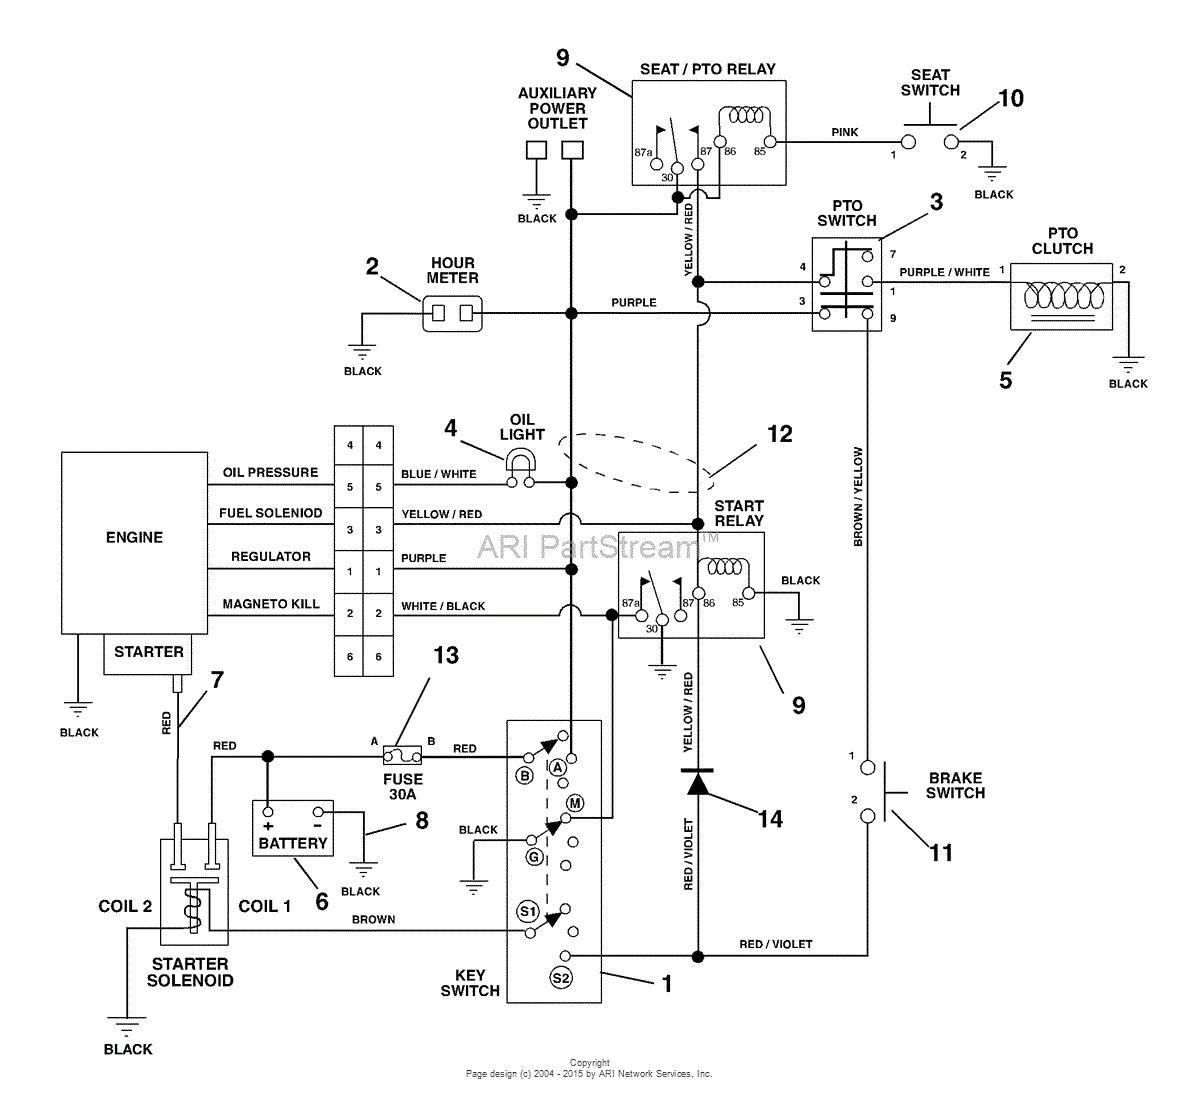 toro lawn mower wiring diagram relay switch wiring diagram toro a3 wiring diagram  relay switch wiring diagram toro a3